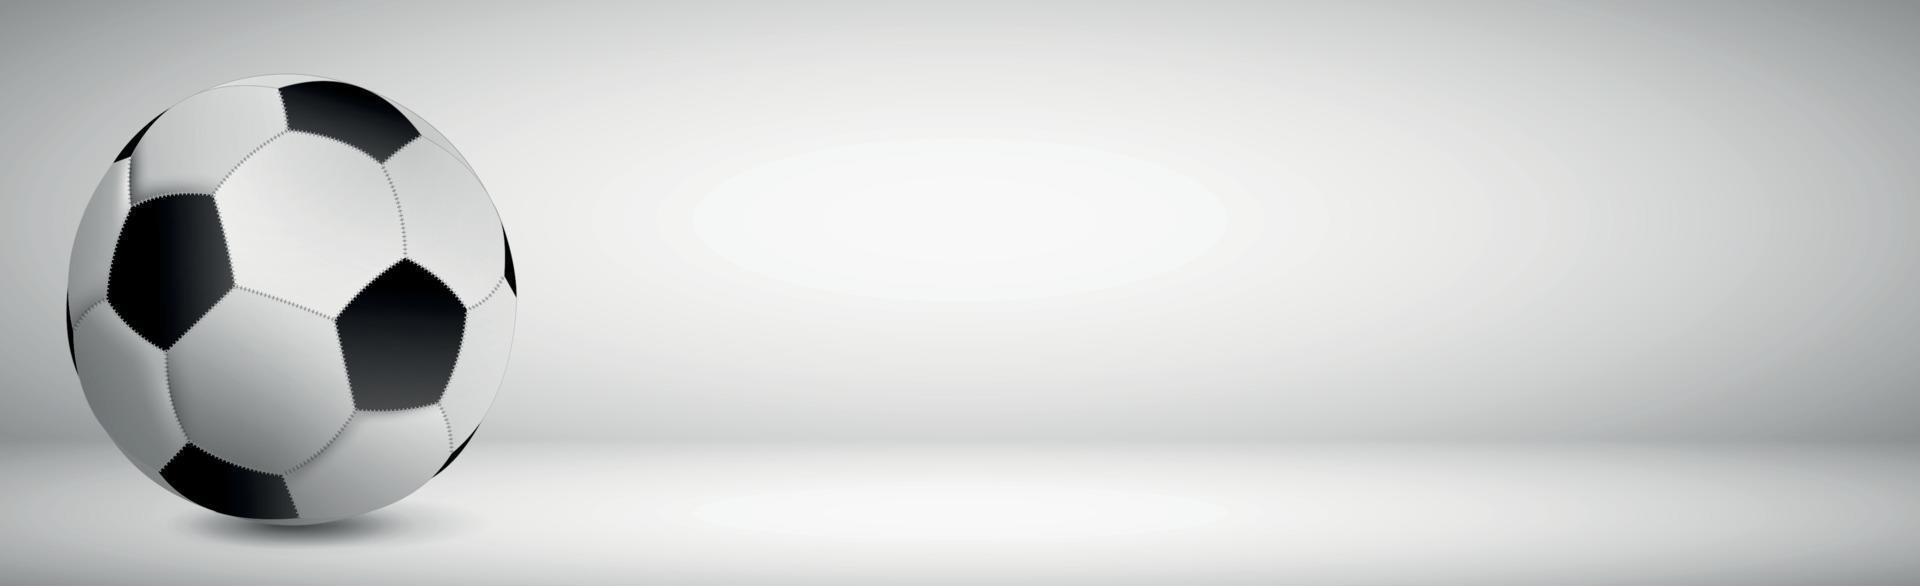 realistisk fotboll på en grå bakgrund vektor